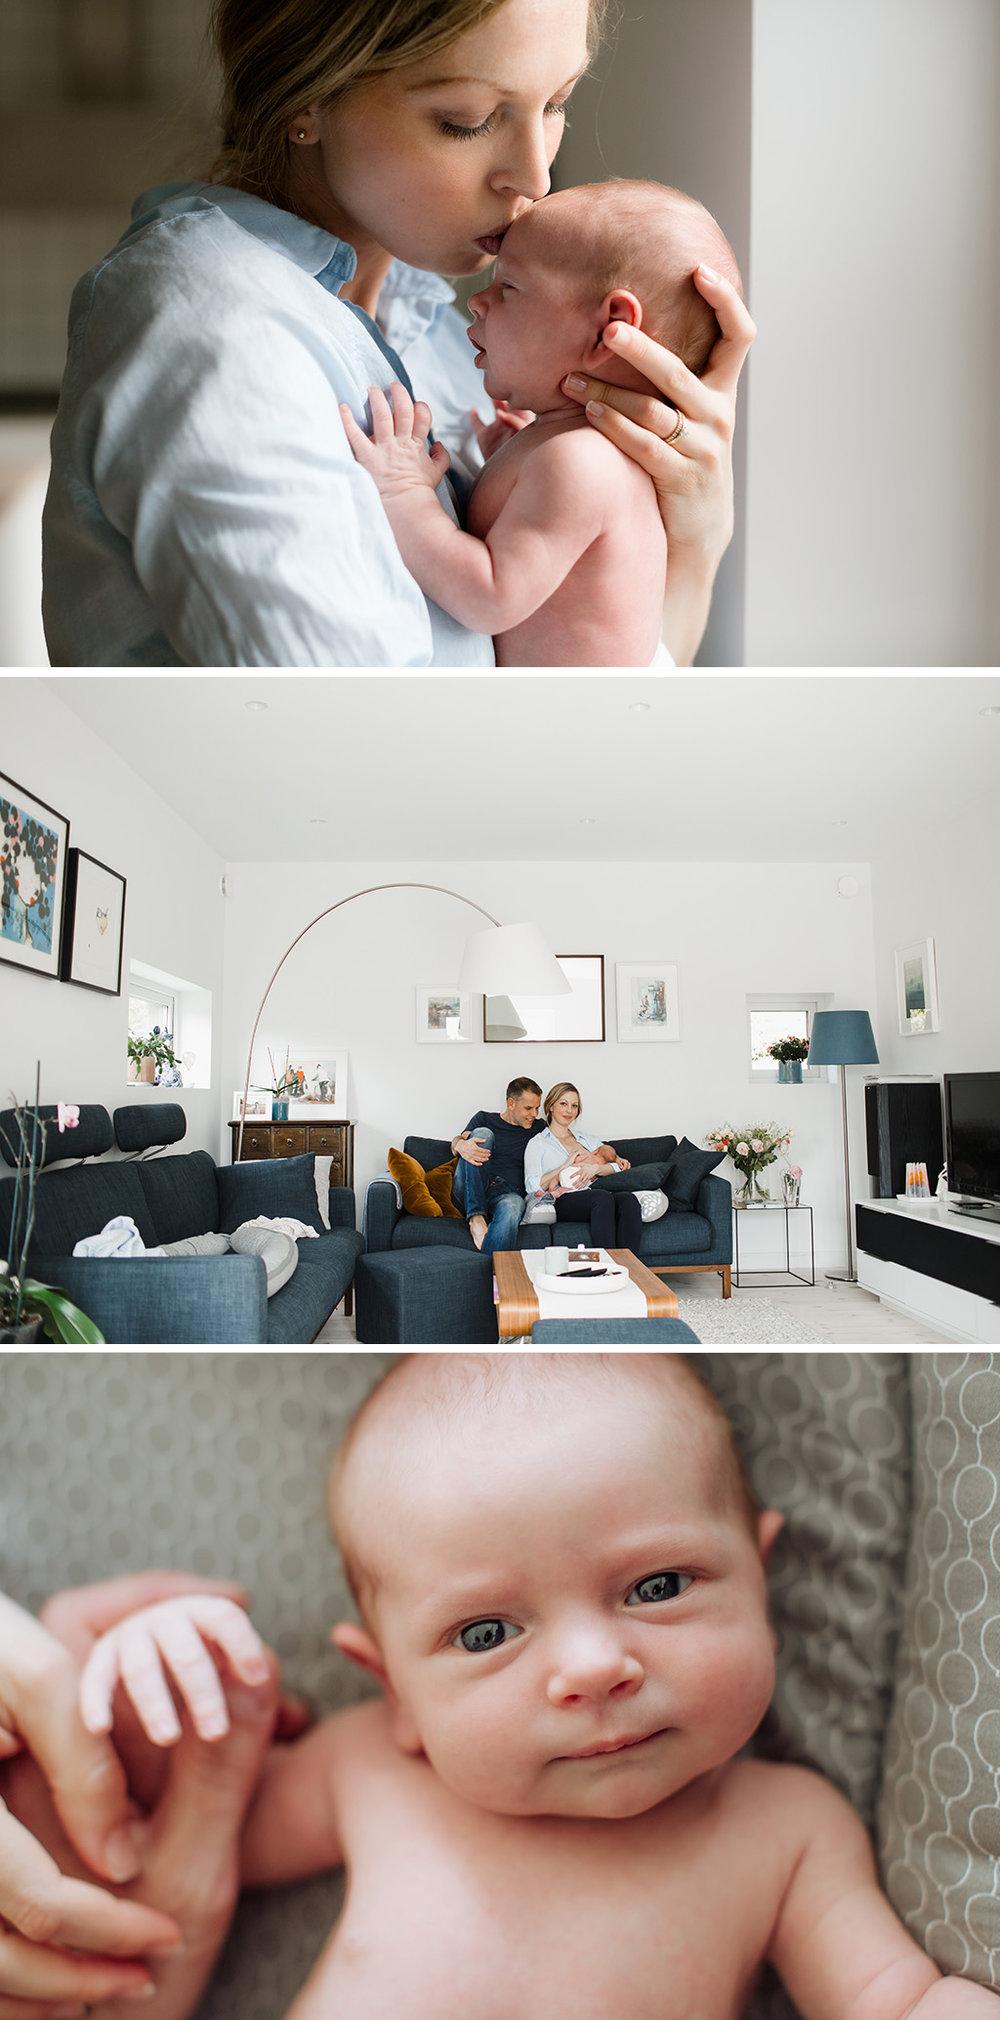 Nyfoddfotografering-i-Stockholm_familjefotograf_Anna-Sandstrom_8.jpg